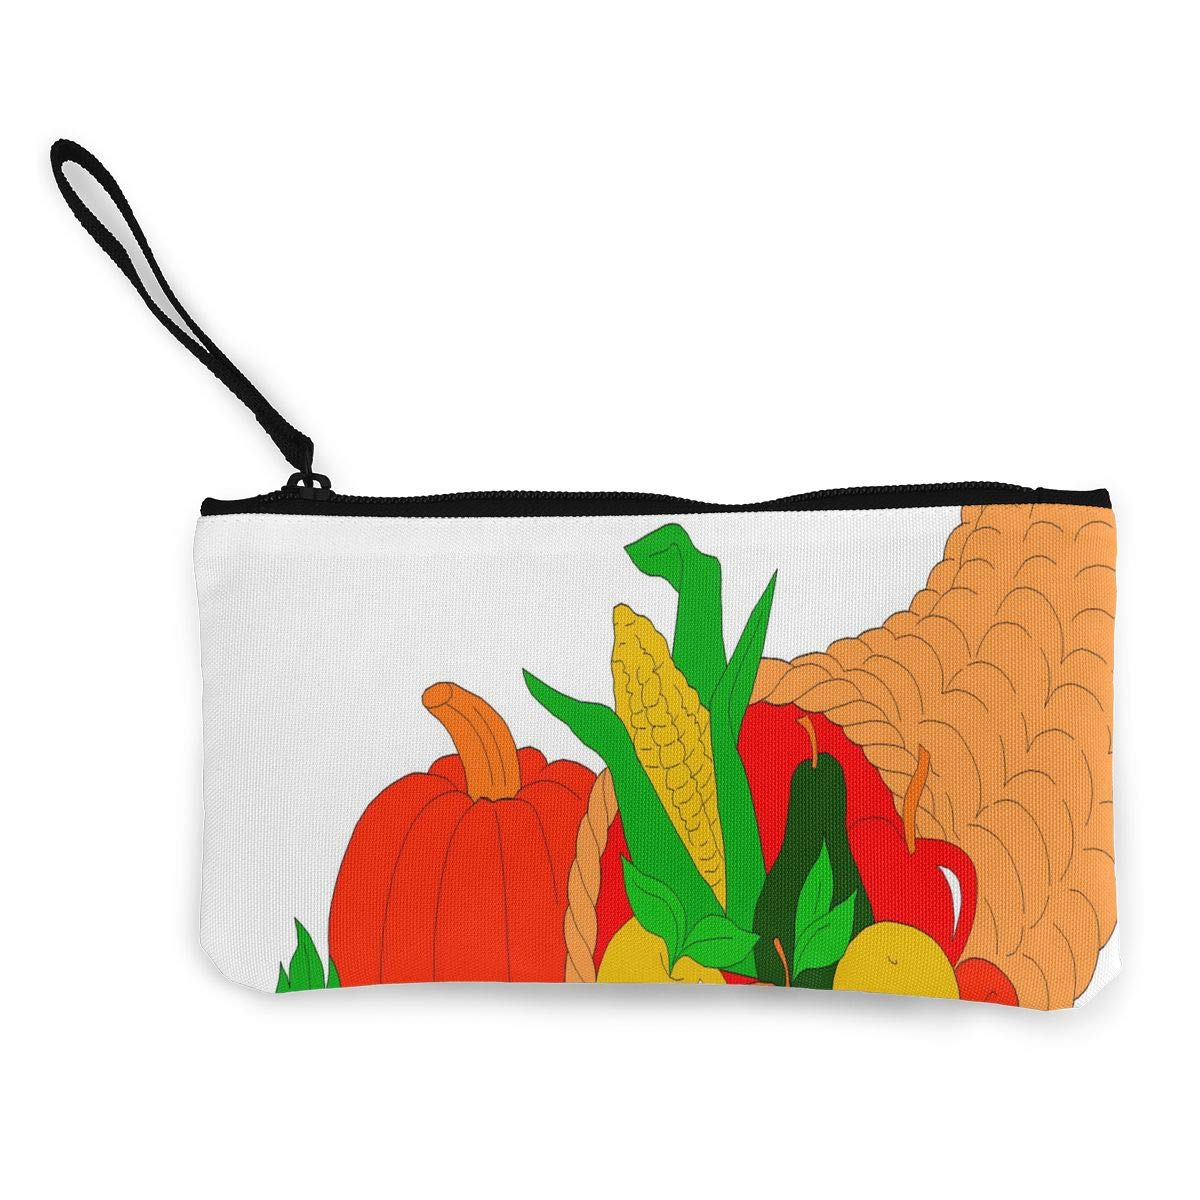 Canvas Coin Purse Citrus Fruit Bowl Cartoon Customs Zipper Pouch Wallet For Cash Bank Car Passport